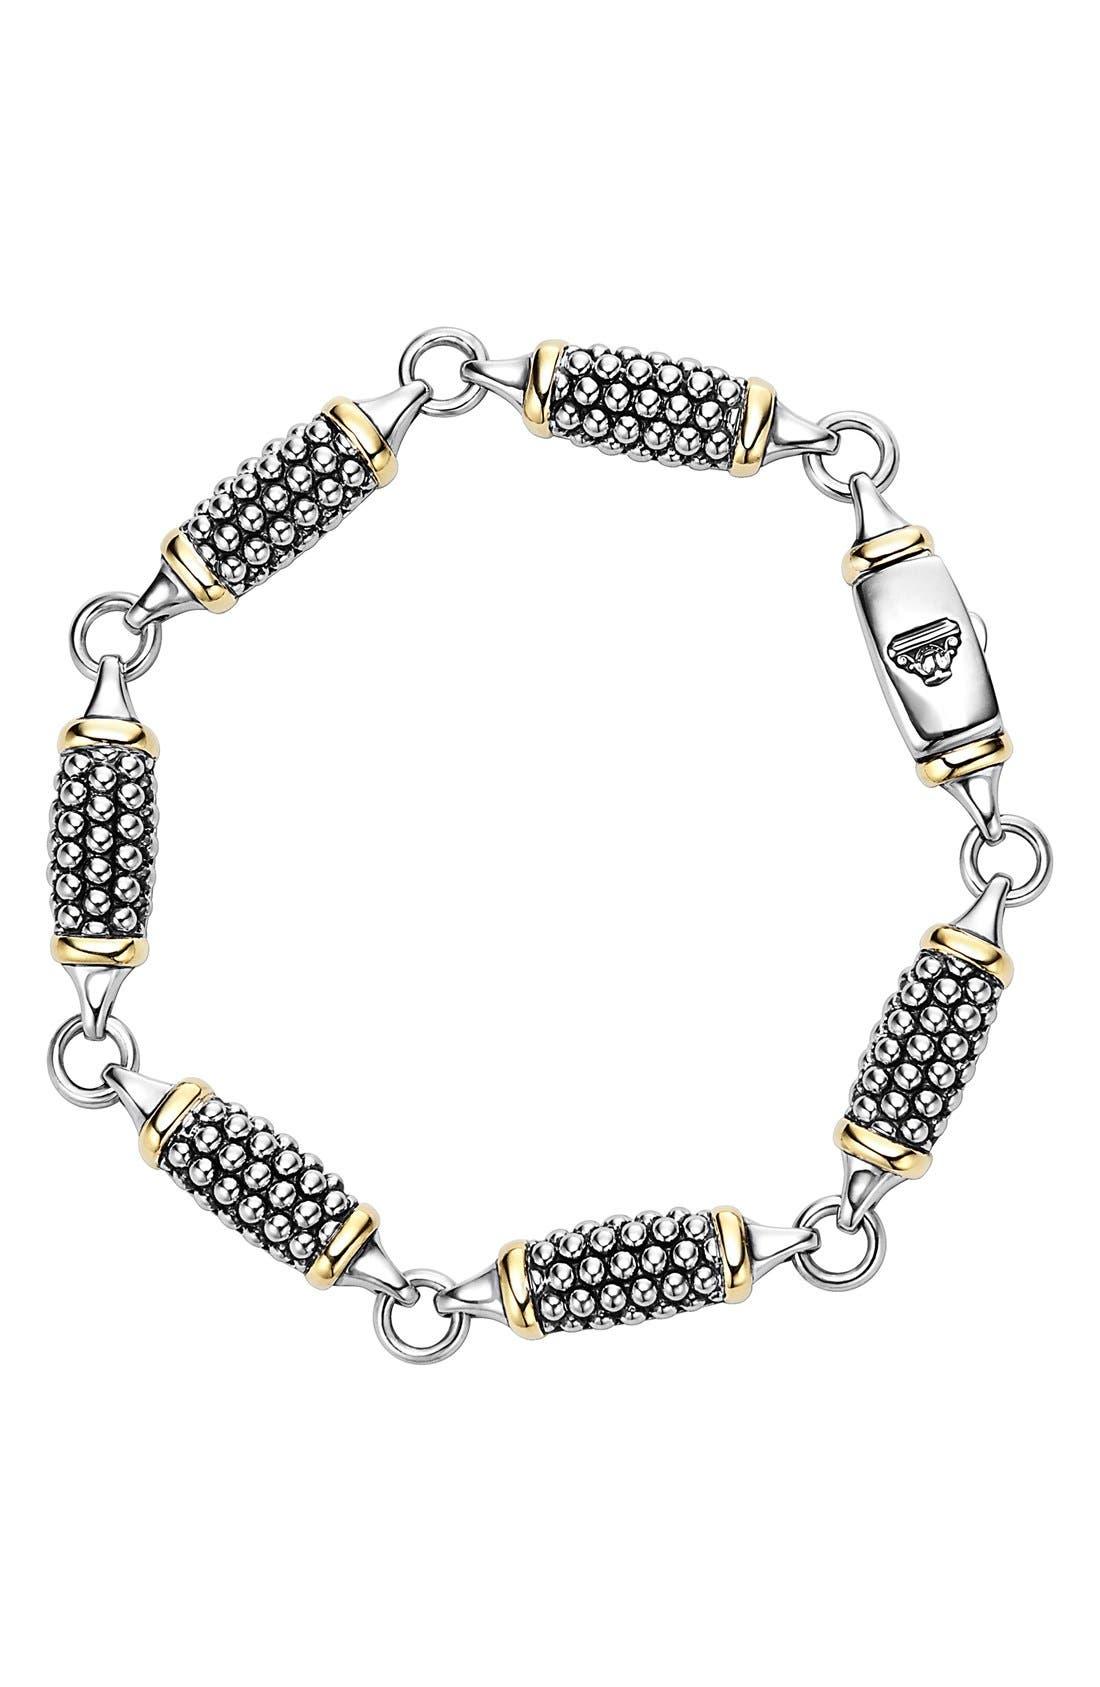 'Caviar Forever' Link Bracelet,                             Main thumbnail 1, color,                             Silver/ Gold